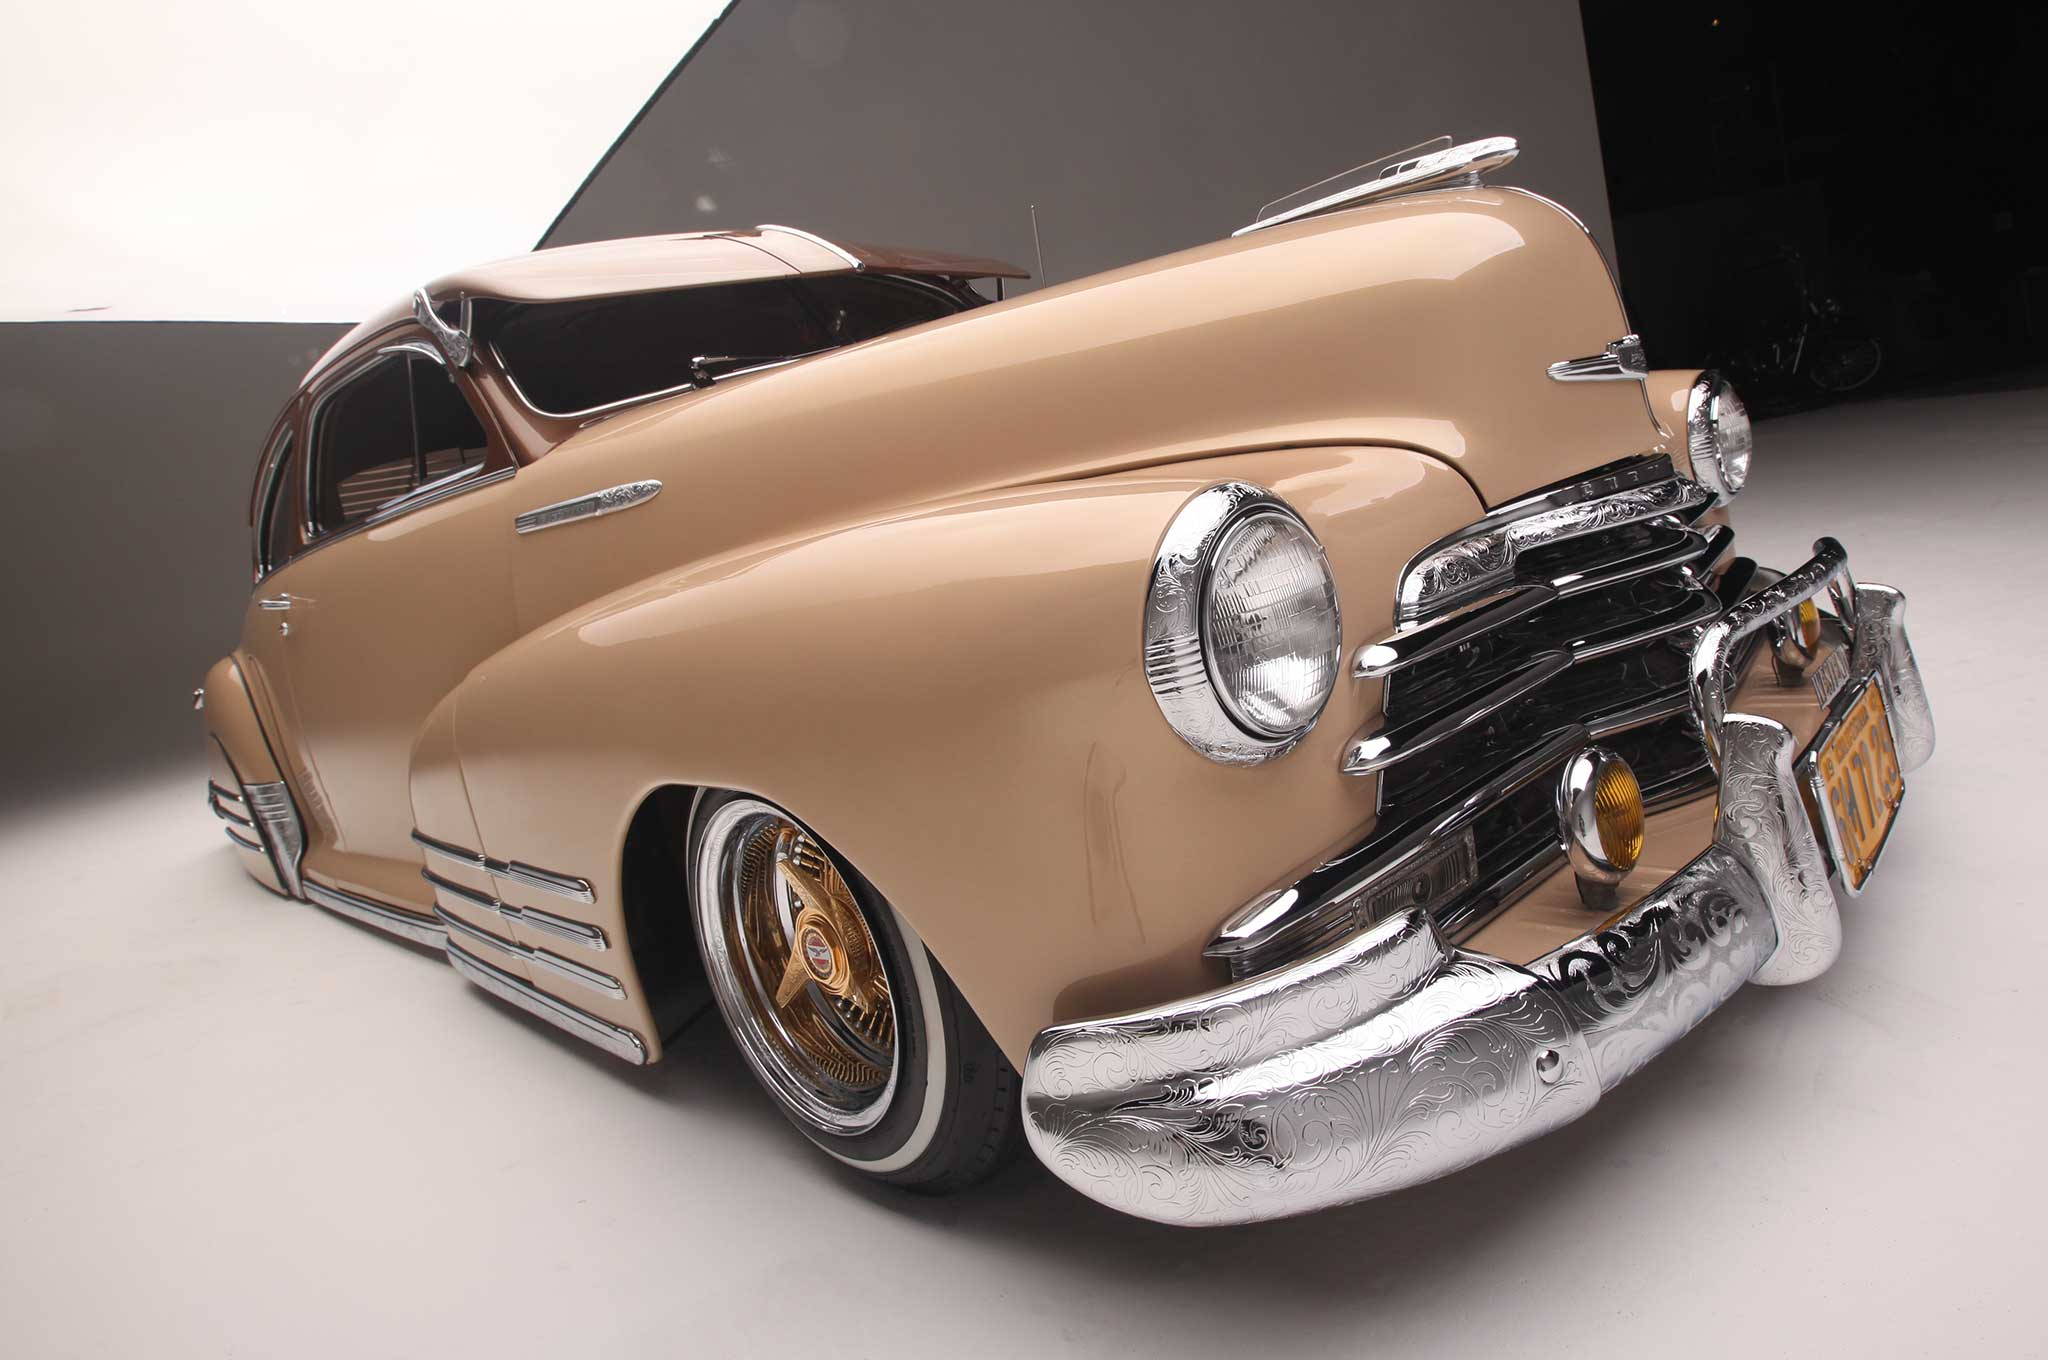 1947 Chevrolet Fleetline - Top of the Line - Lowrider